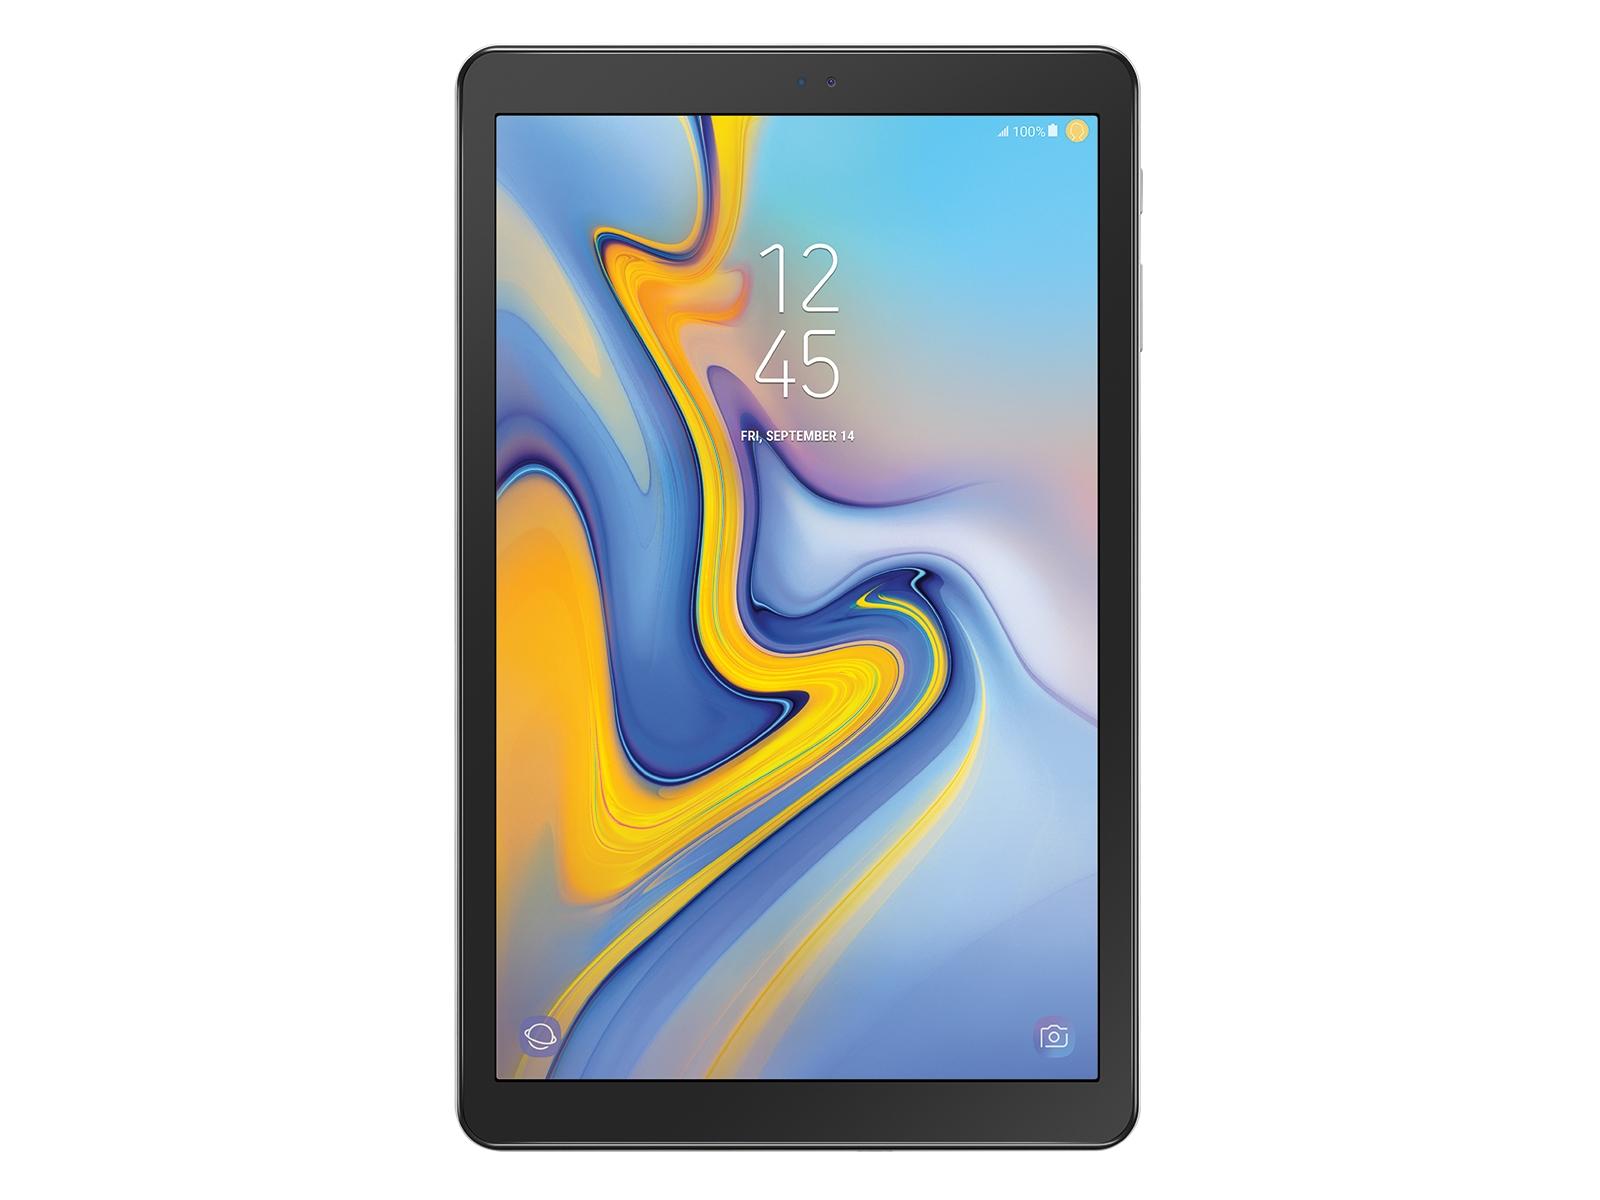 Galaxy Tab A 10.5, 32GB, Gray (Wi-Fi)